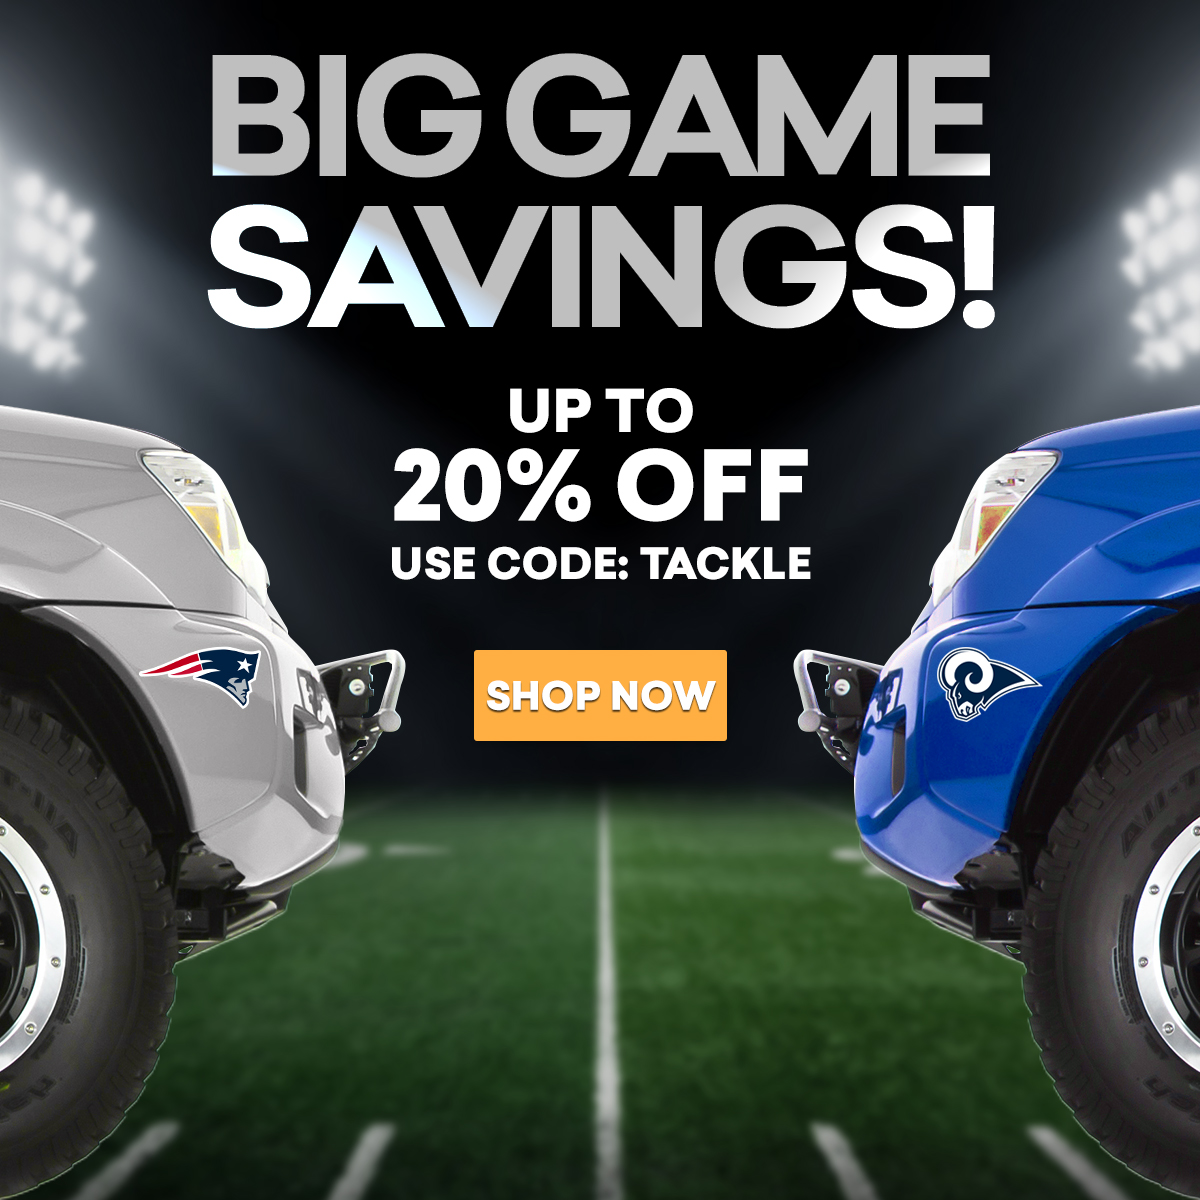 gall score big savings - HD1200×1200